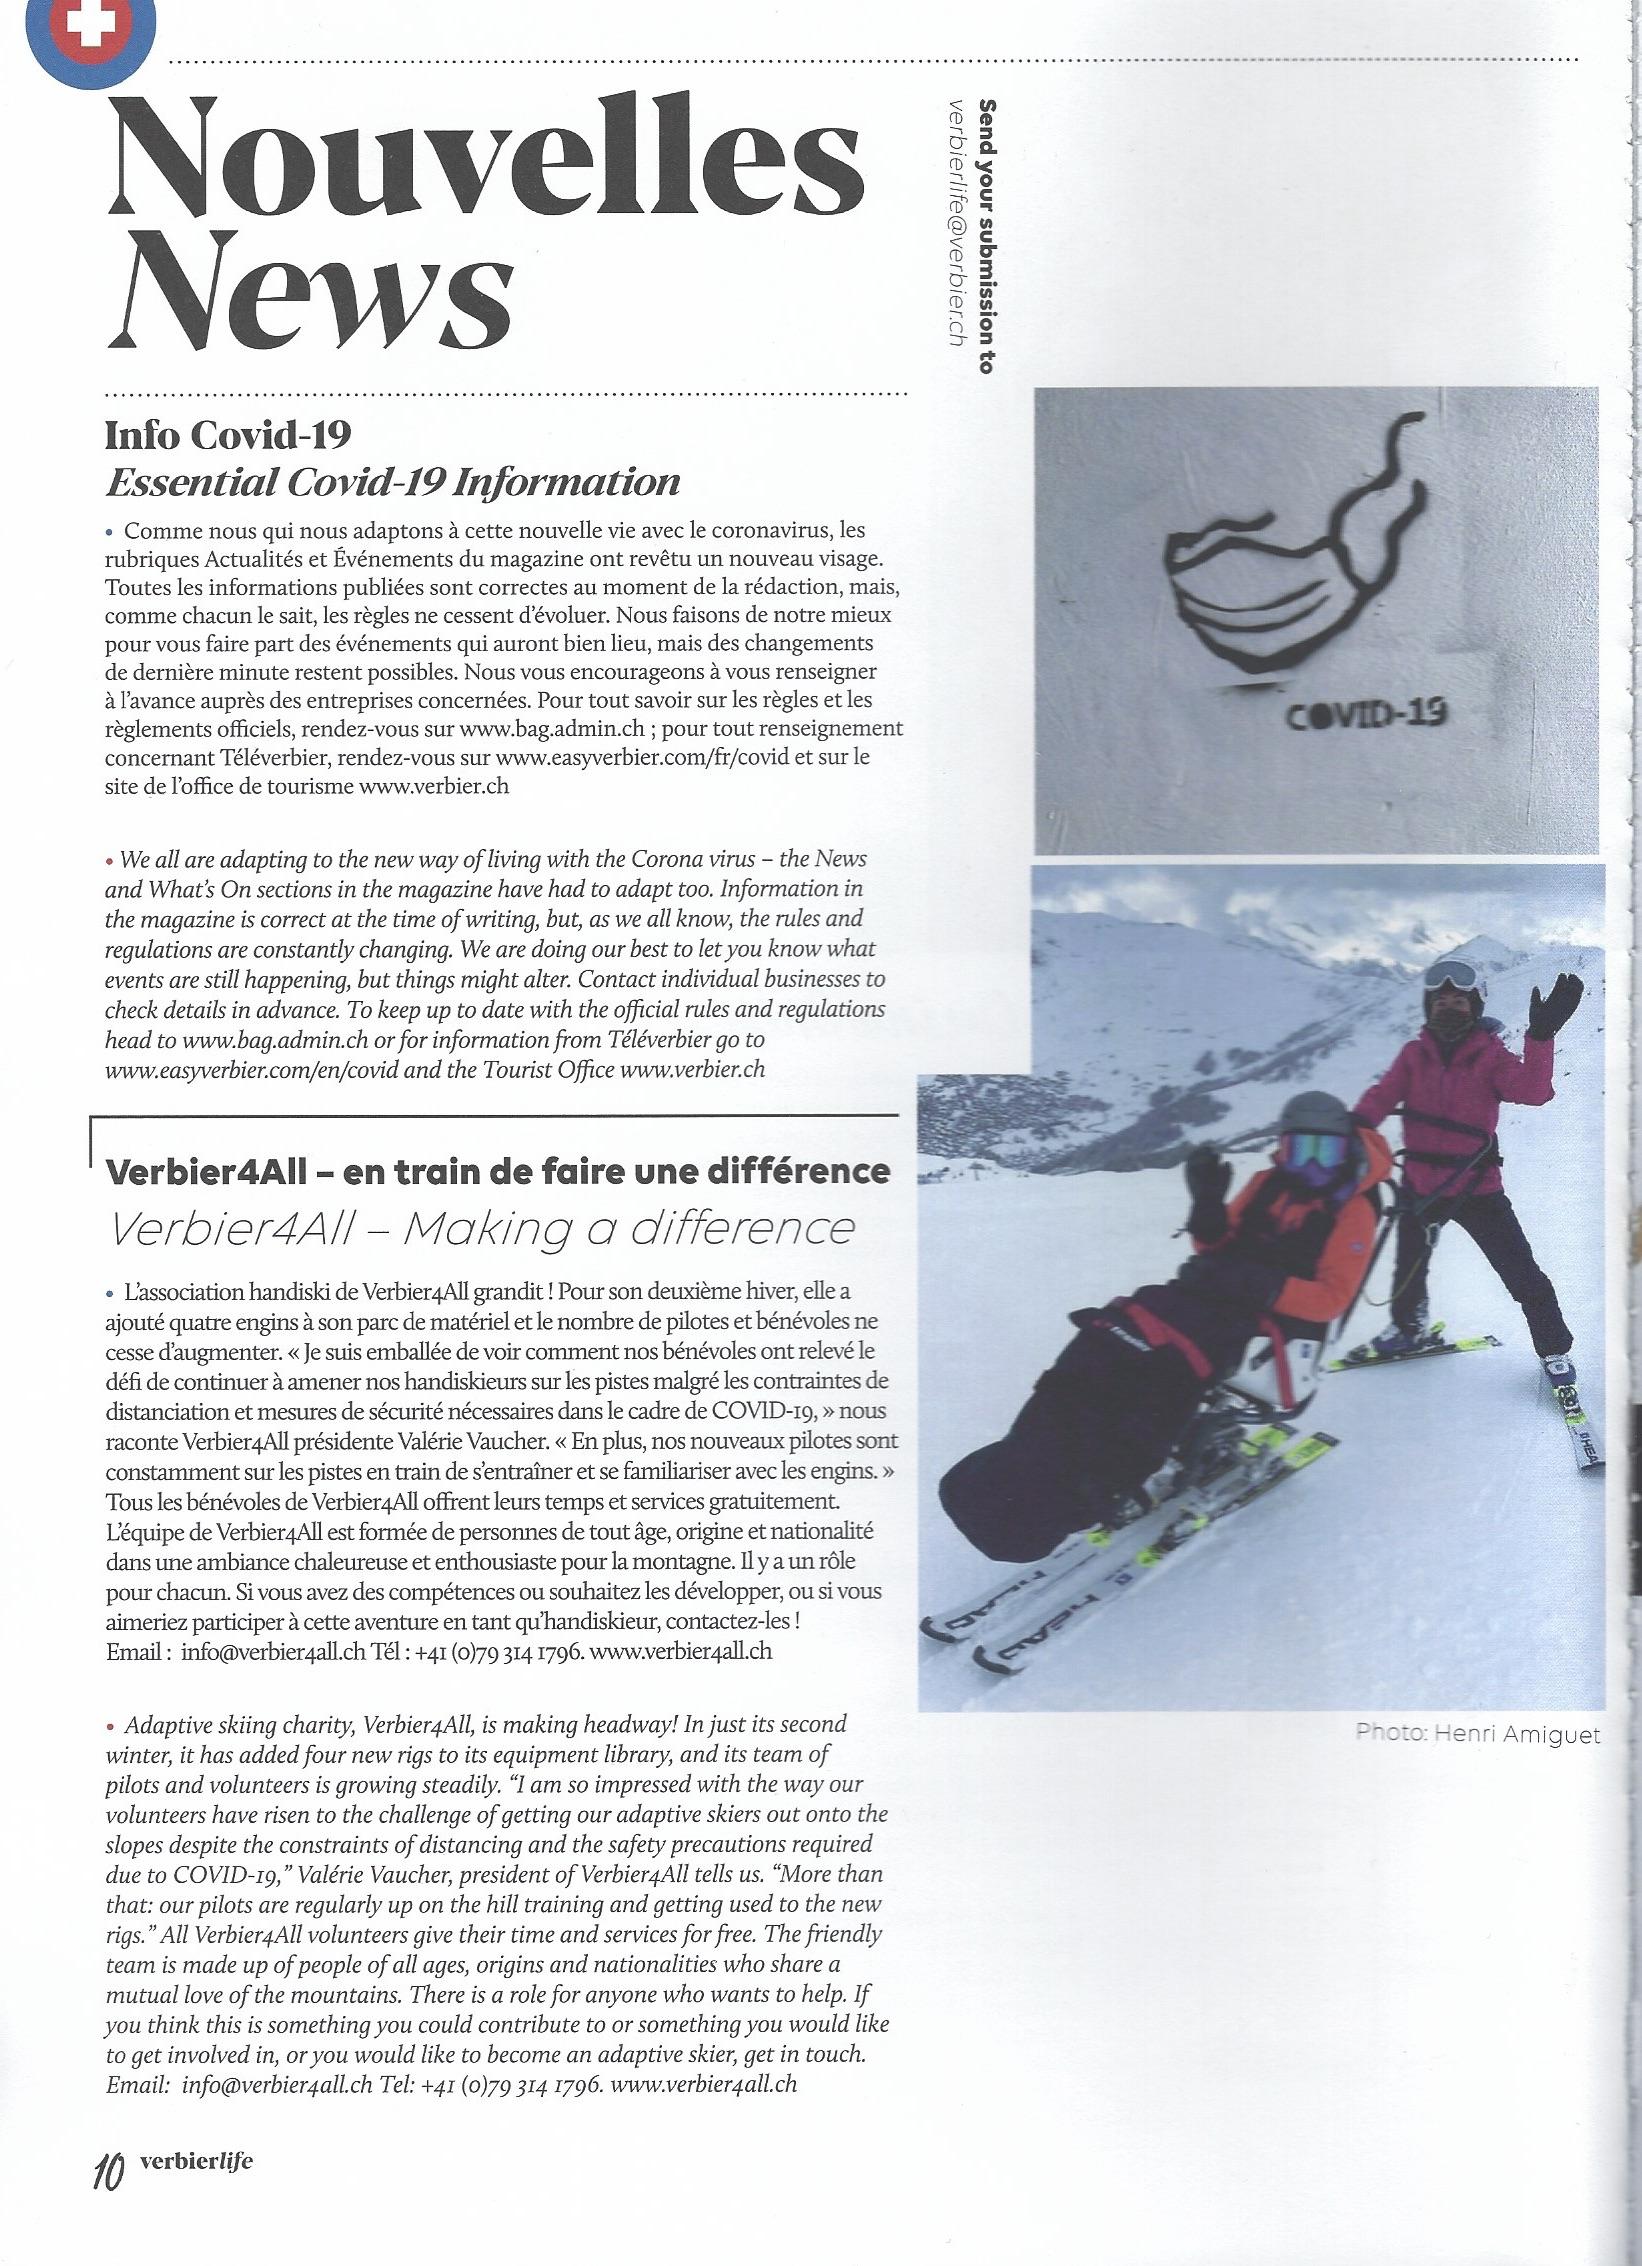 Verbier Life news item Feb 2021